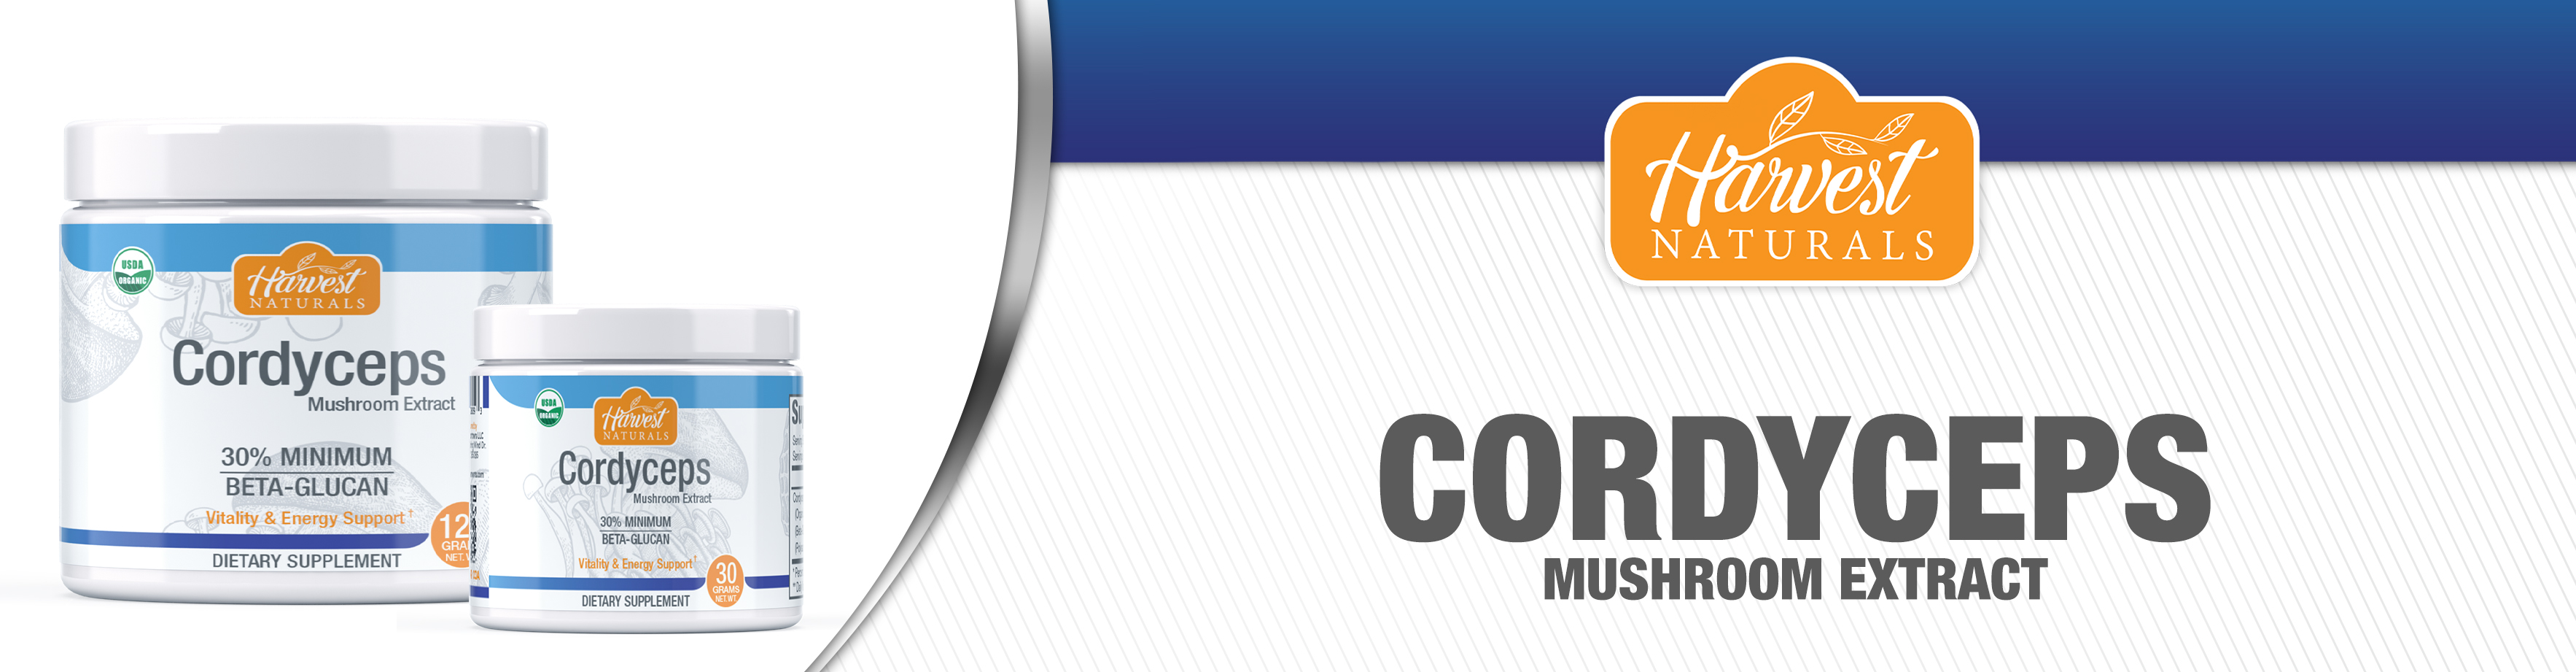 cordyceps-mushroom-powder-10-21.jpg